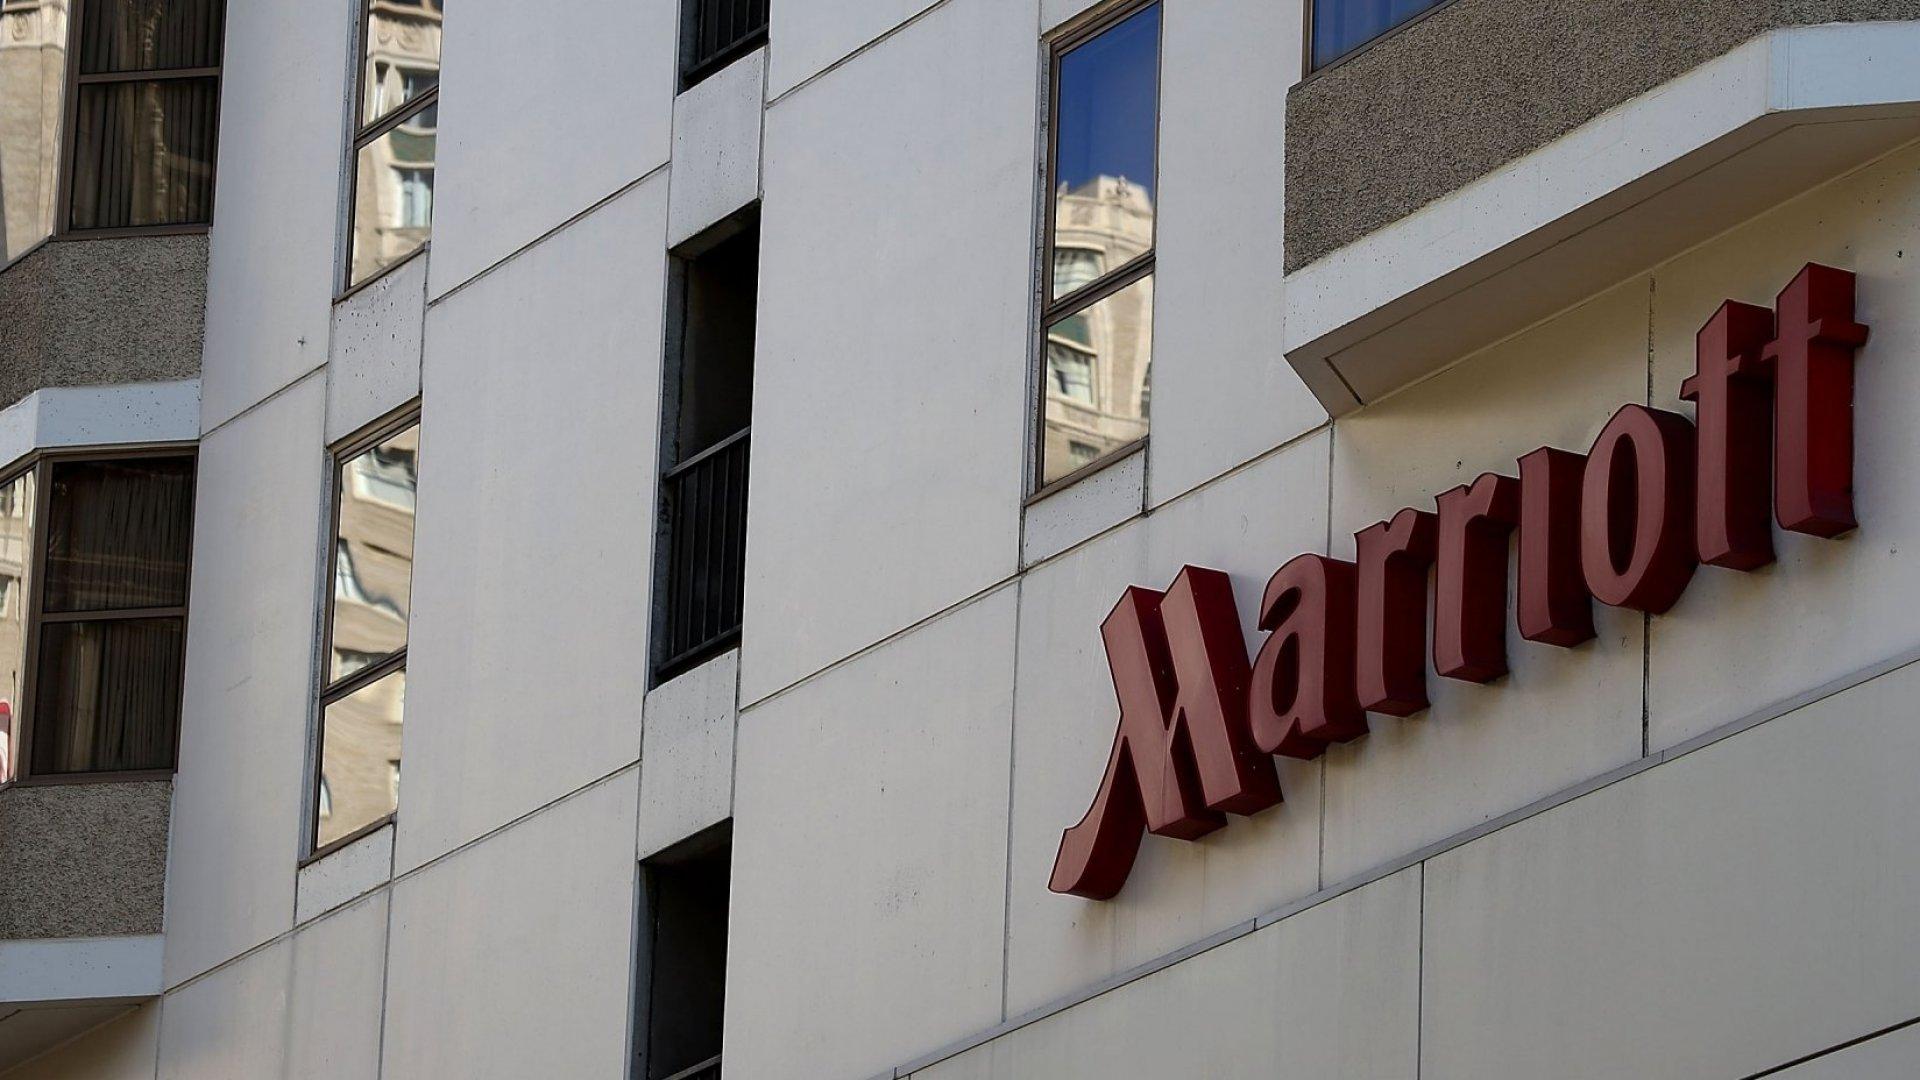 Up to 500 Million Customers' Data Stolen in Massive Marriott Security Breach